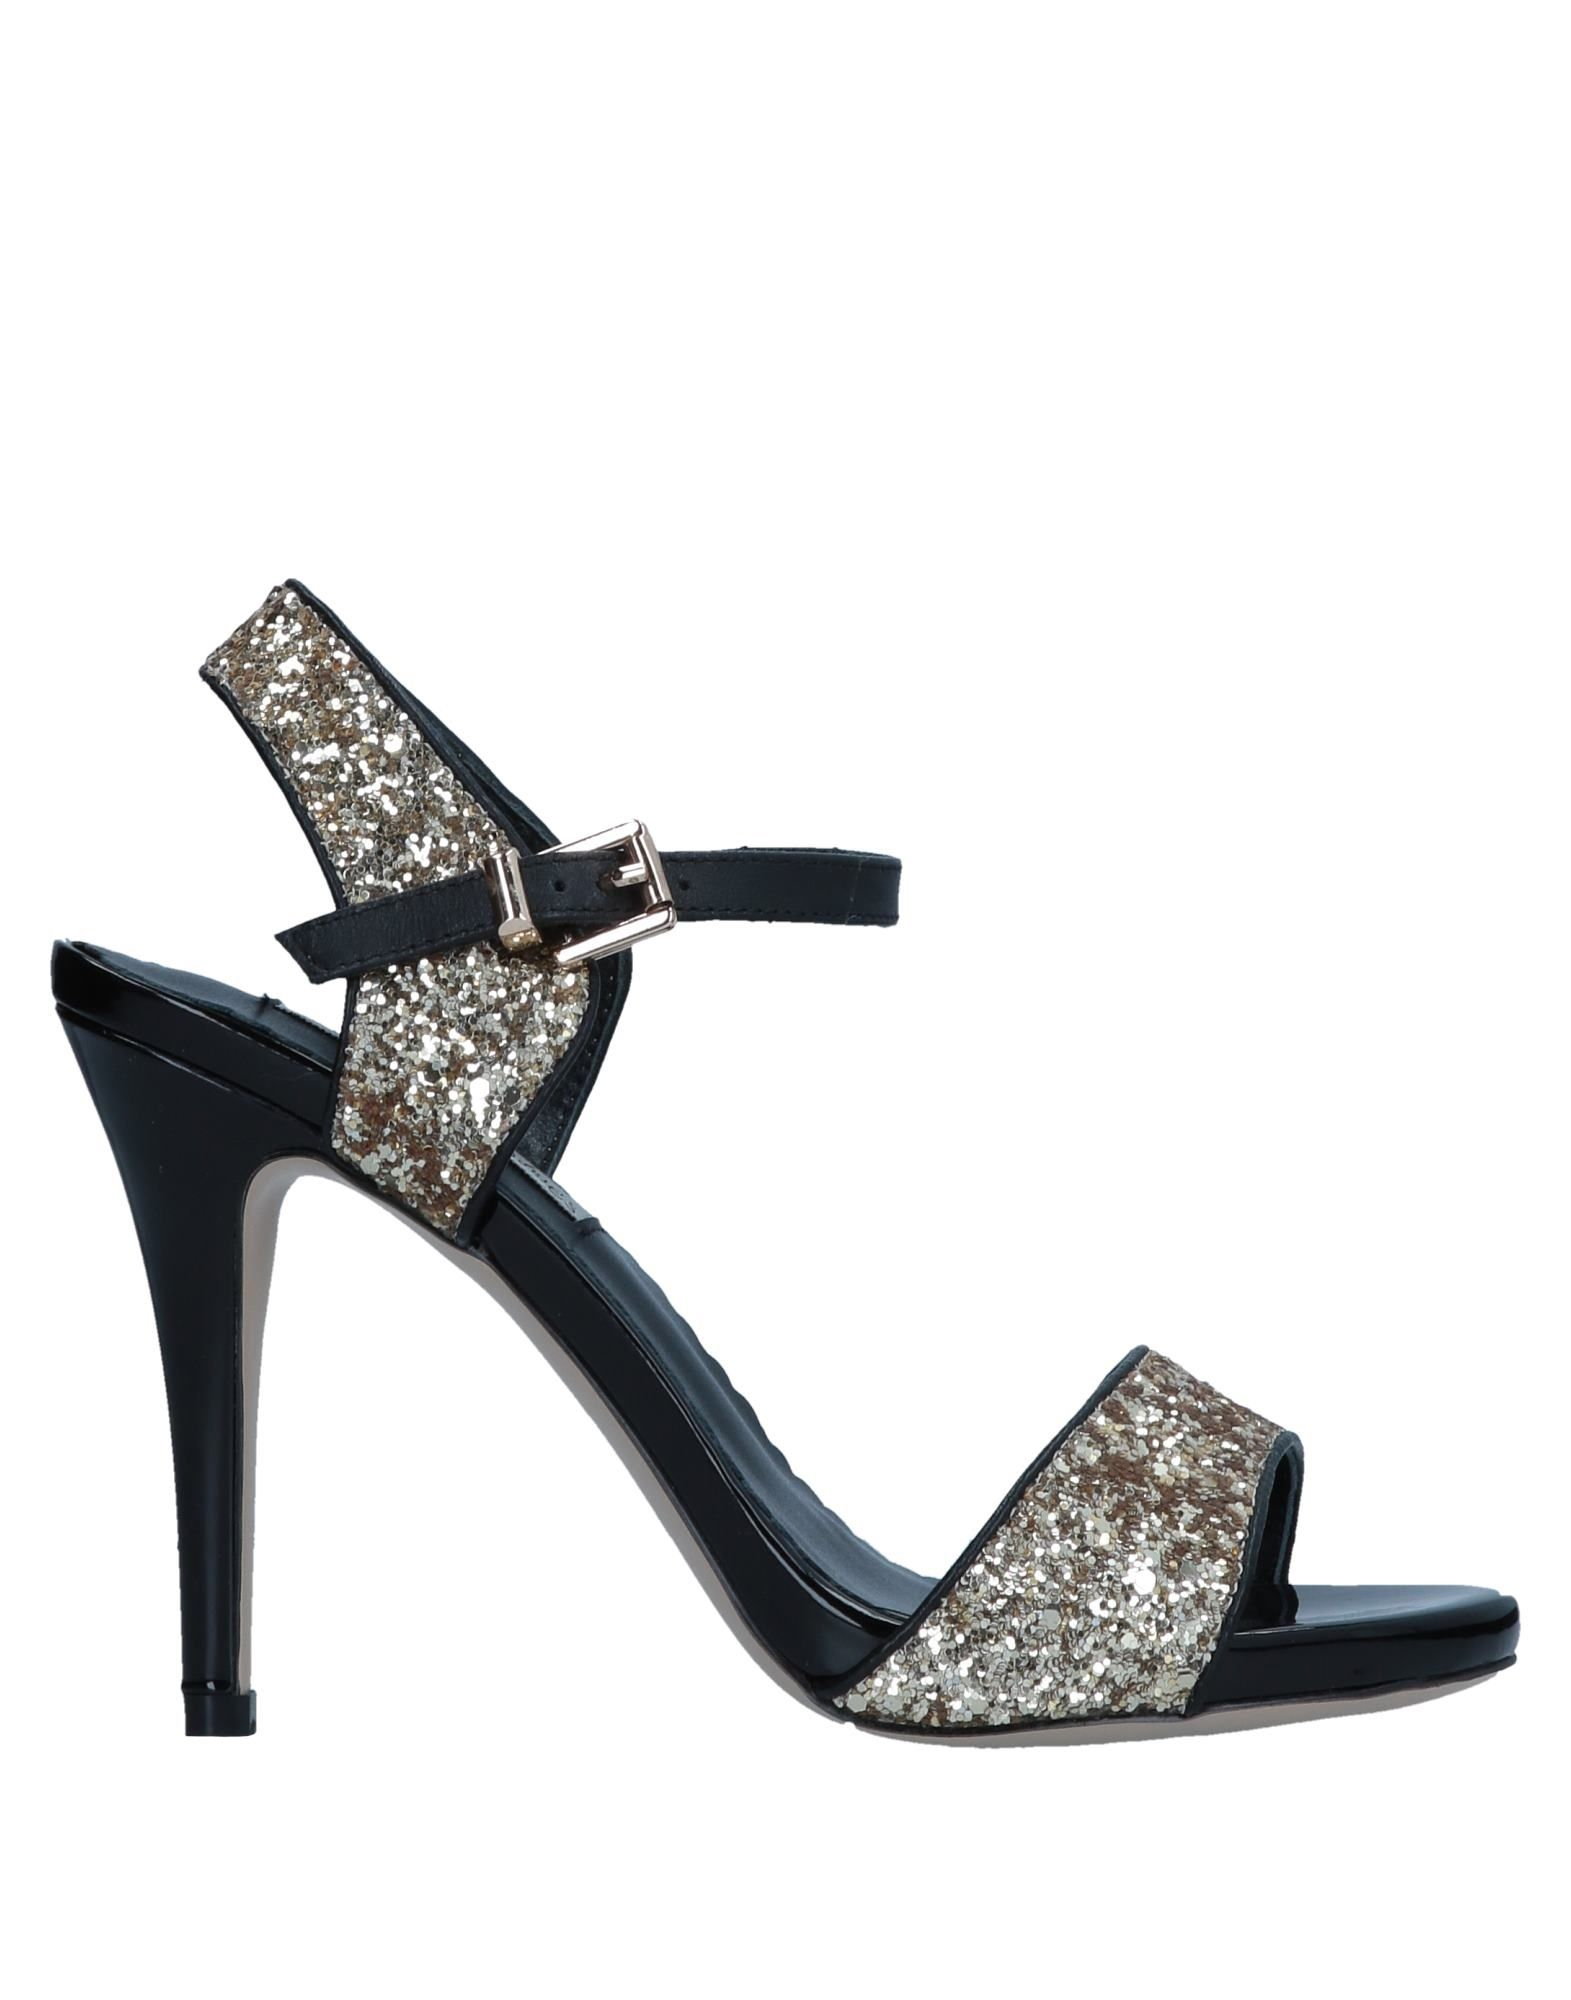 Tosca Blu Shoes Sandals - Women Tosca Blu Shoes Australia Sandals online on  Australia Shoes - 11544310QV 2b46bd